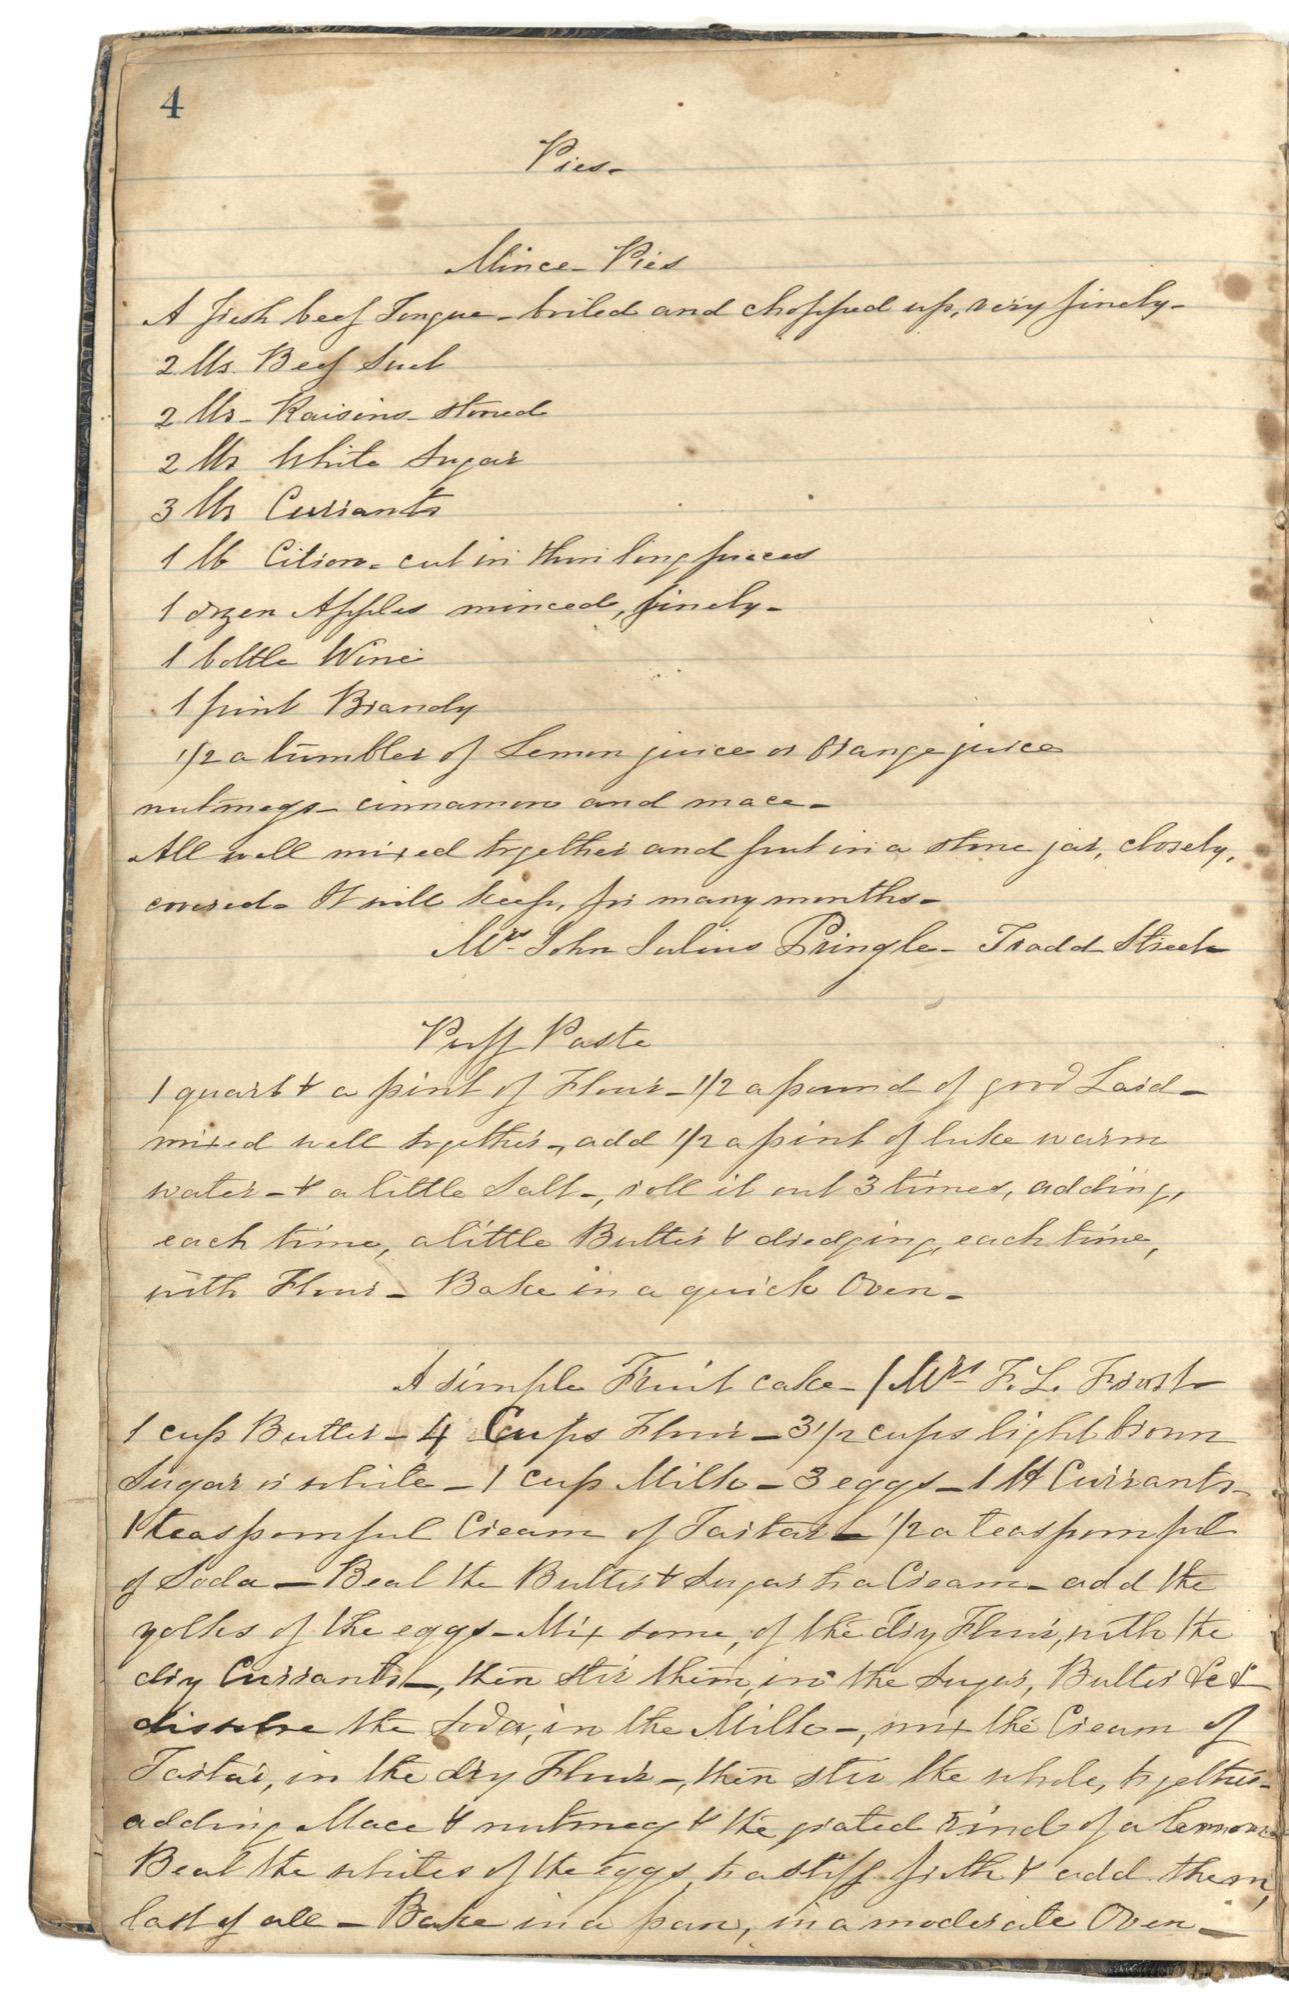 Mary Motte Alston Pringle Receipt Book, Page 8